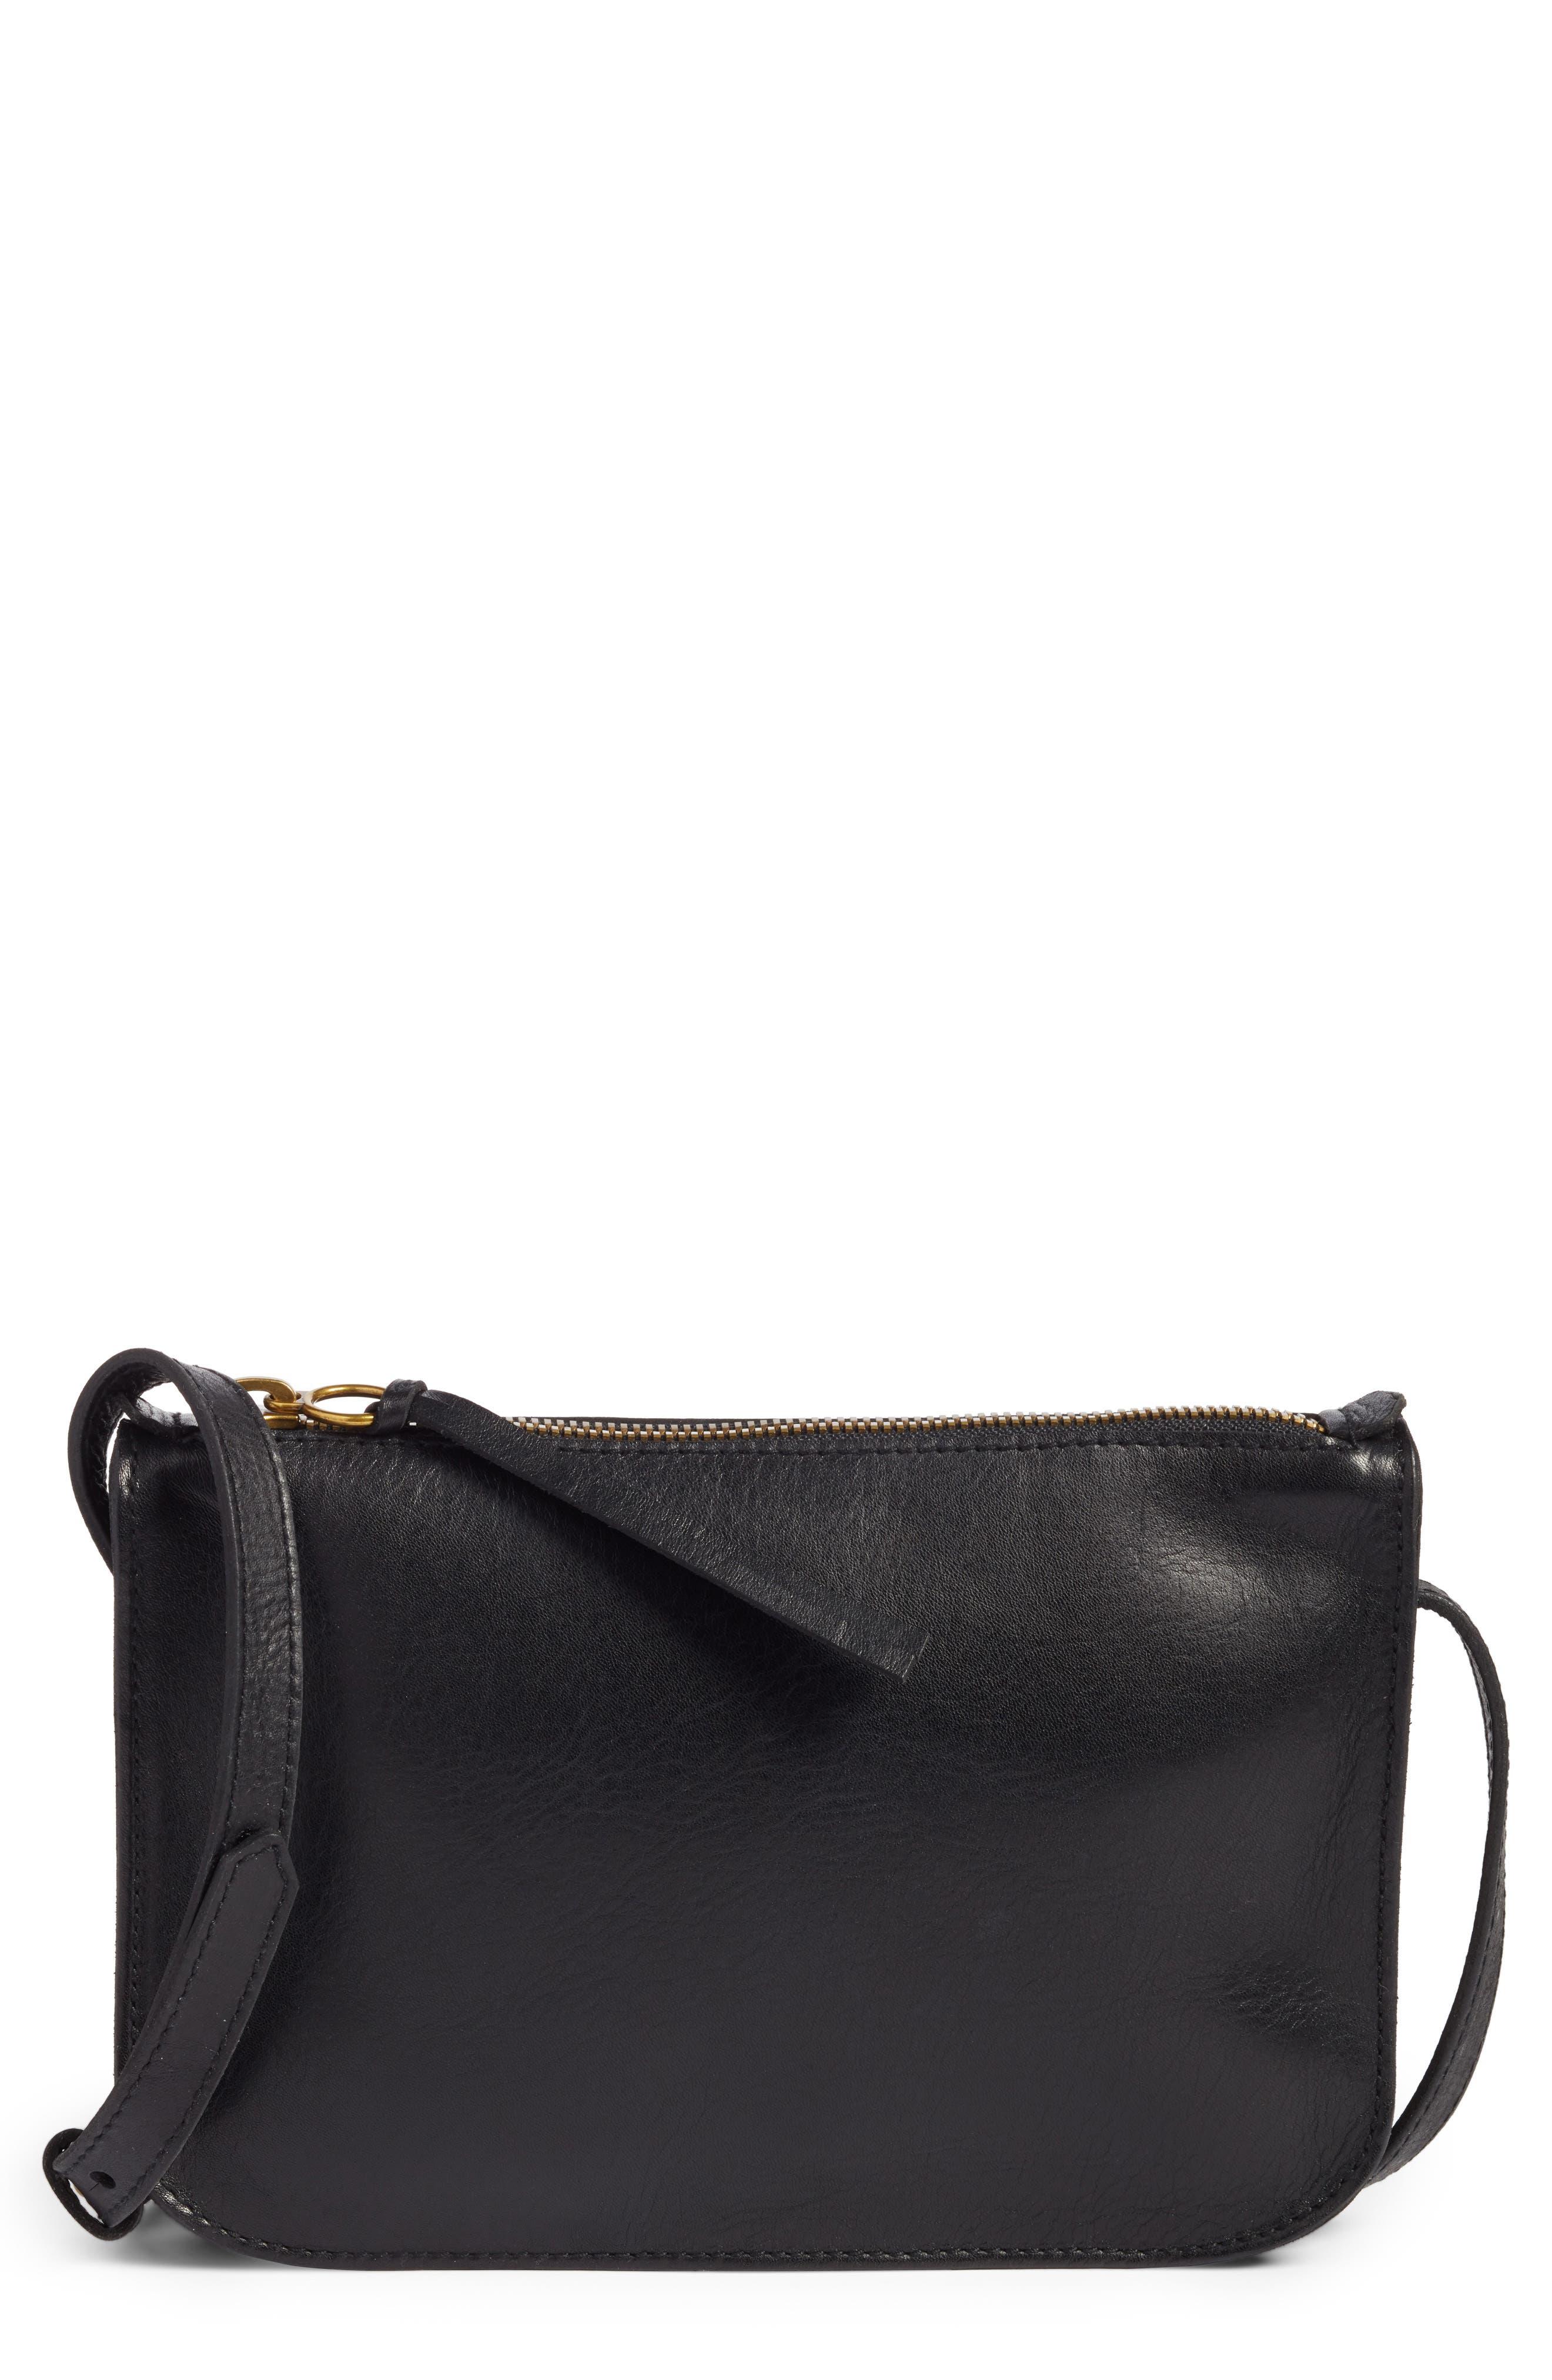 The Simple Leather Crossbody Bag,                             Main thumbnail 1, color,                             True Black